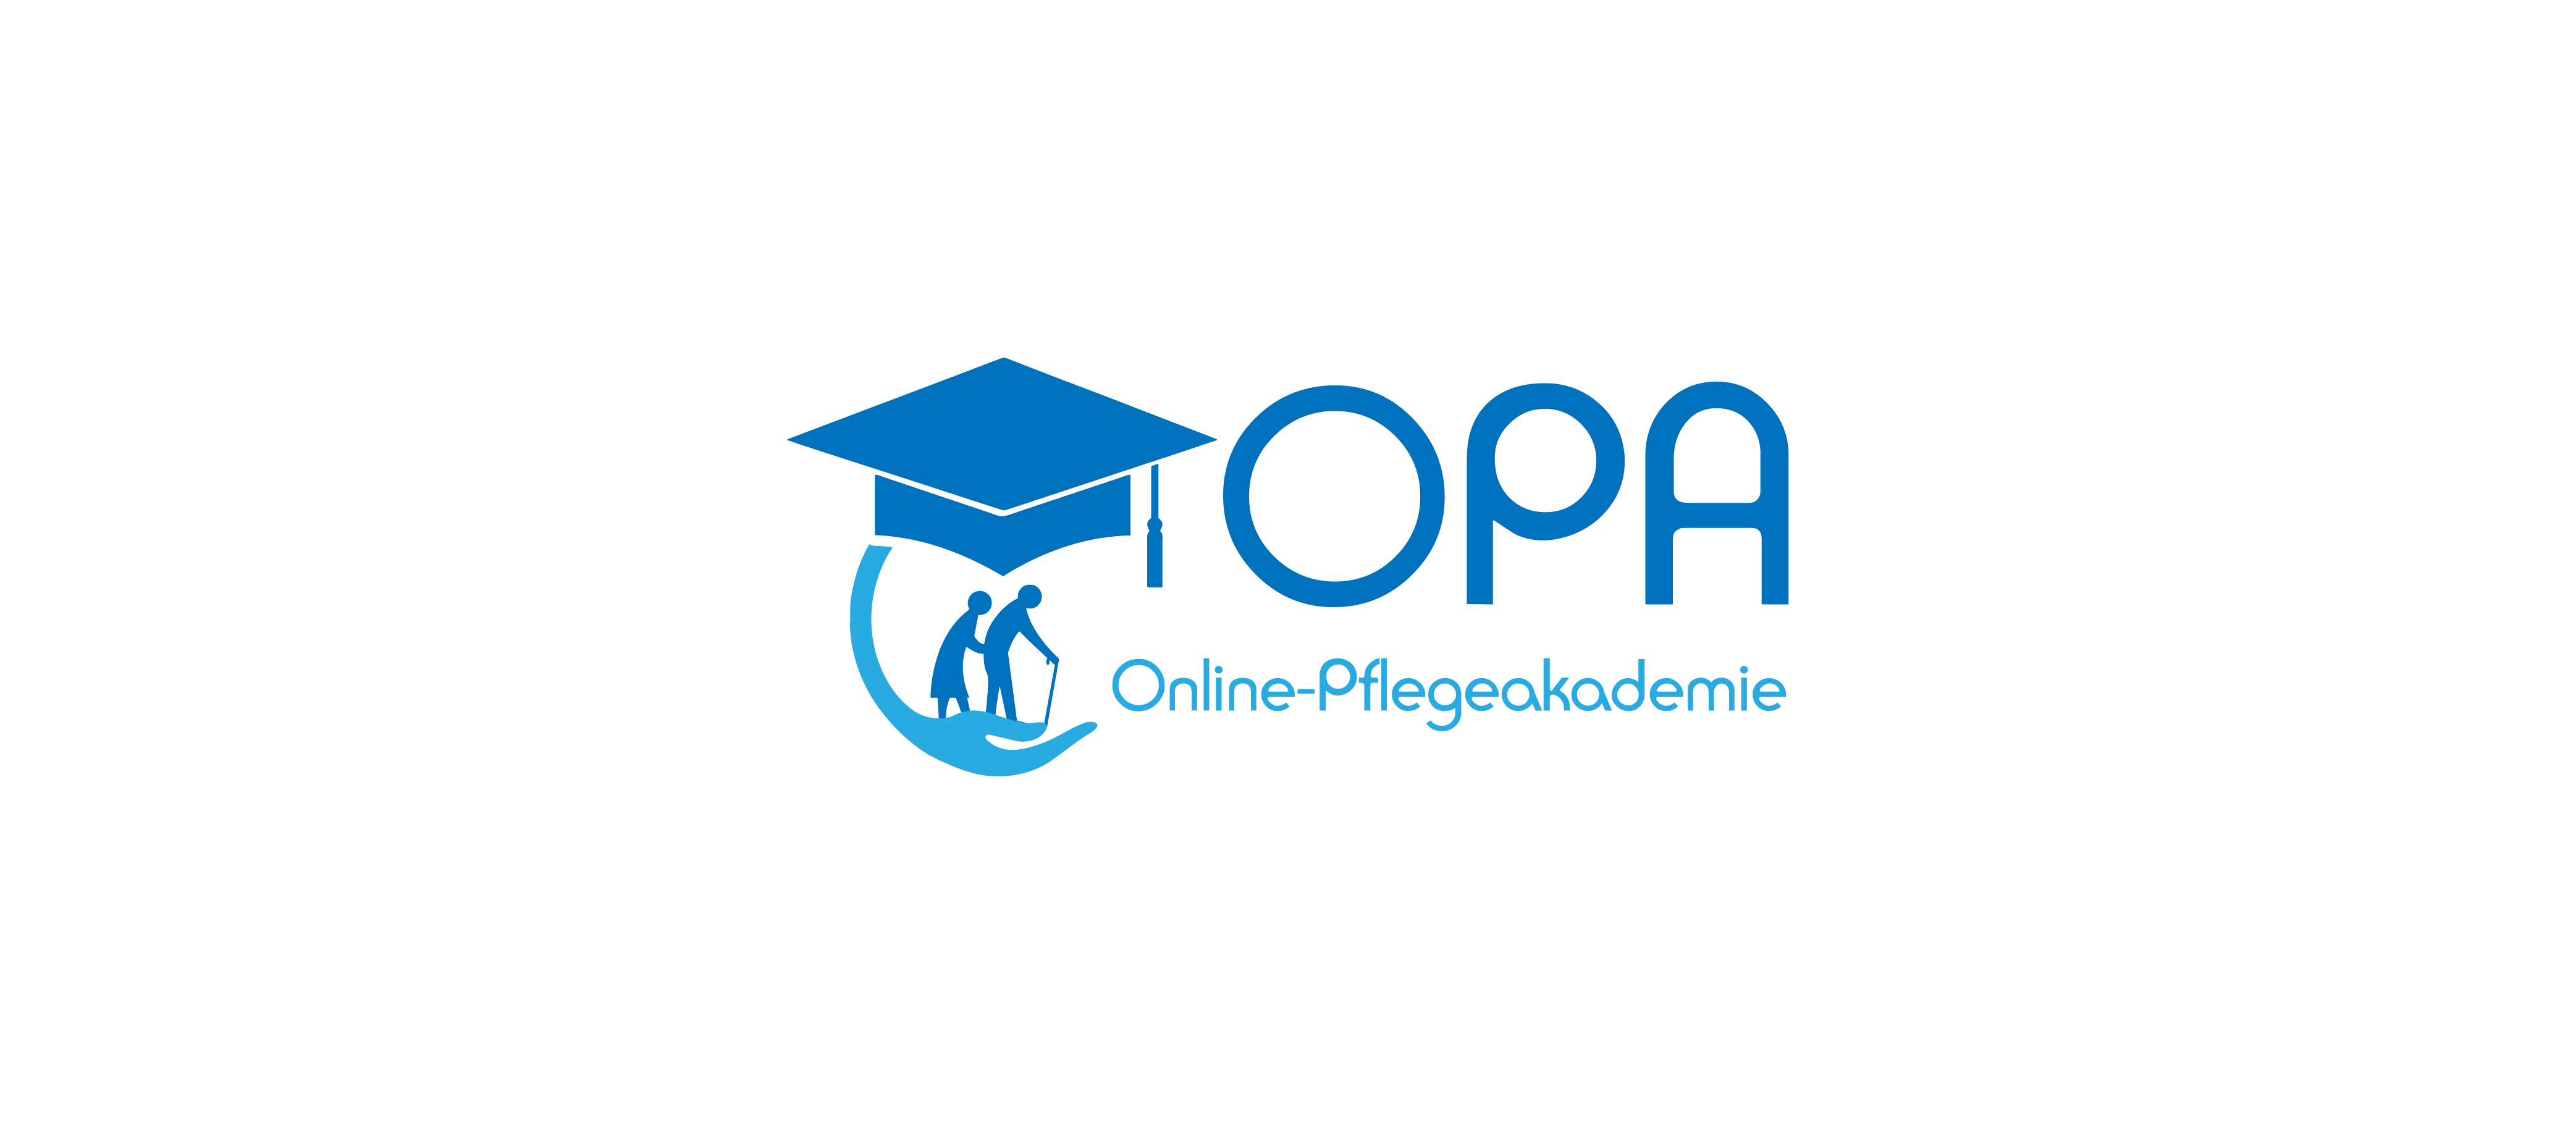 Onlinepflegeakademie